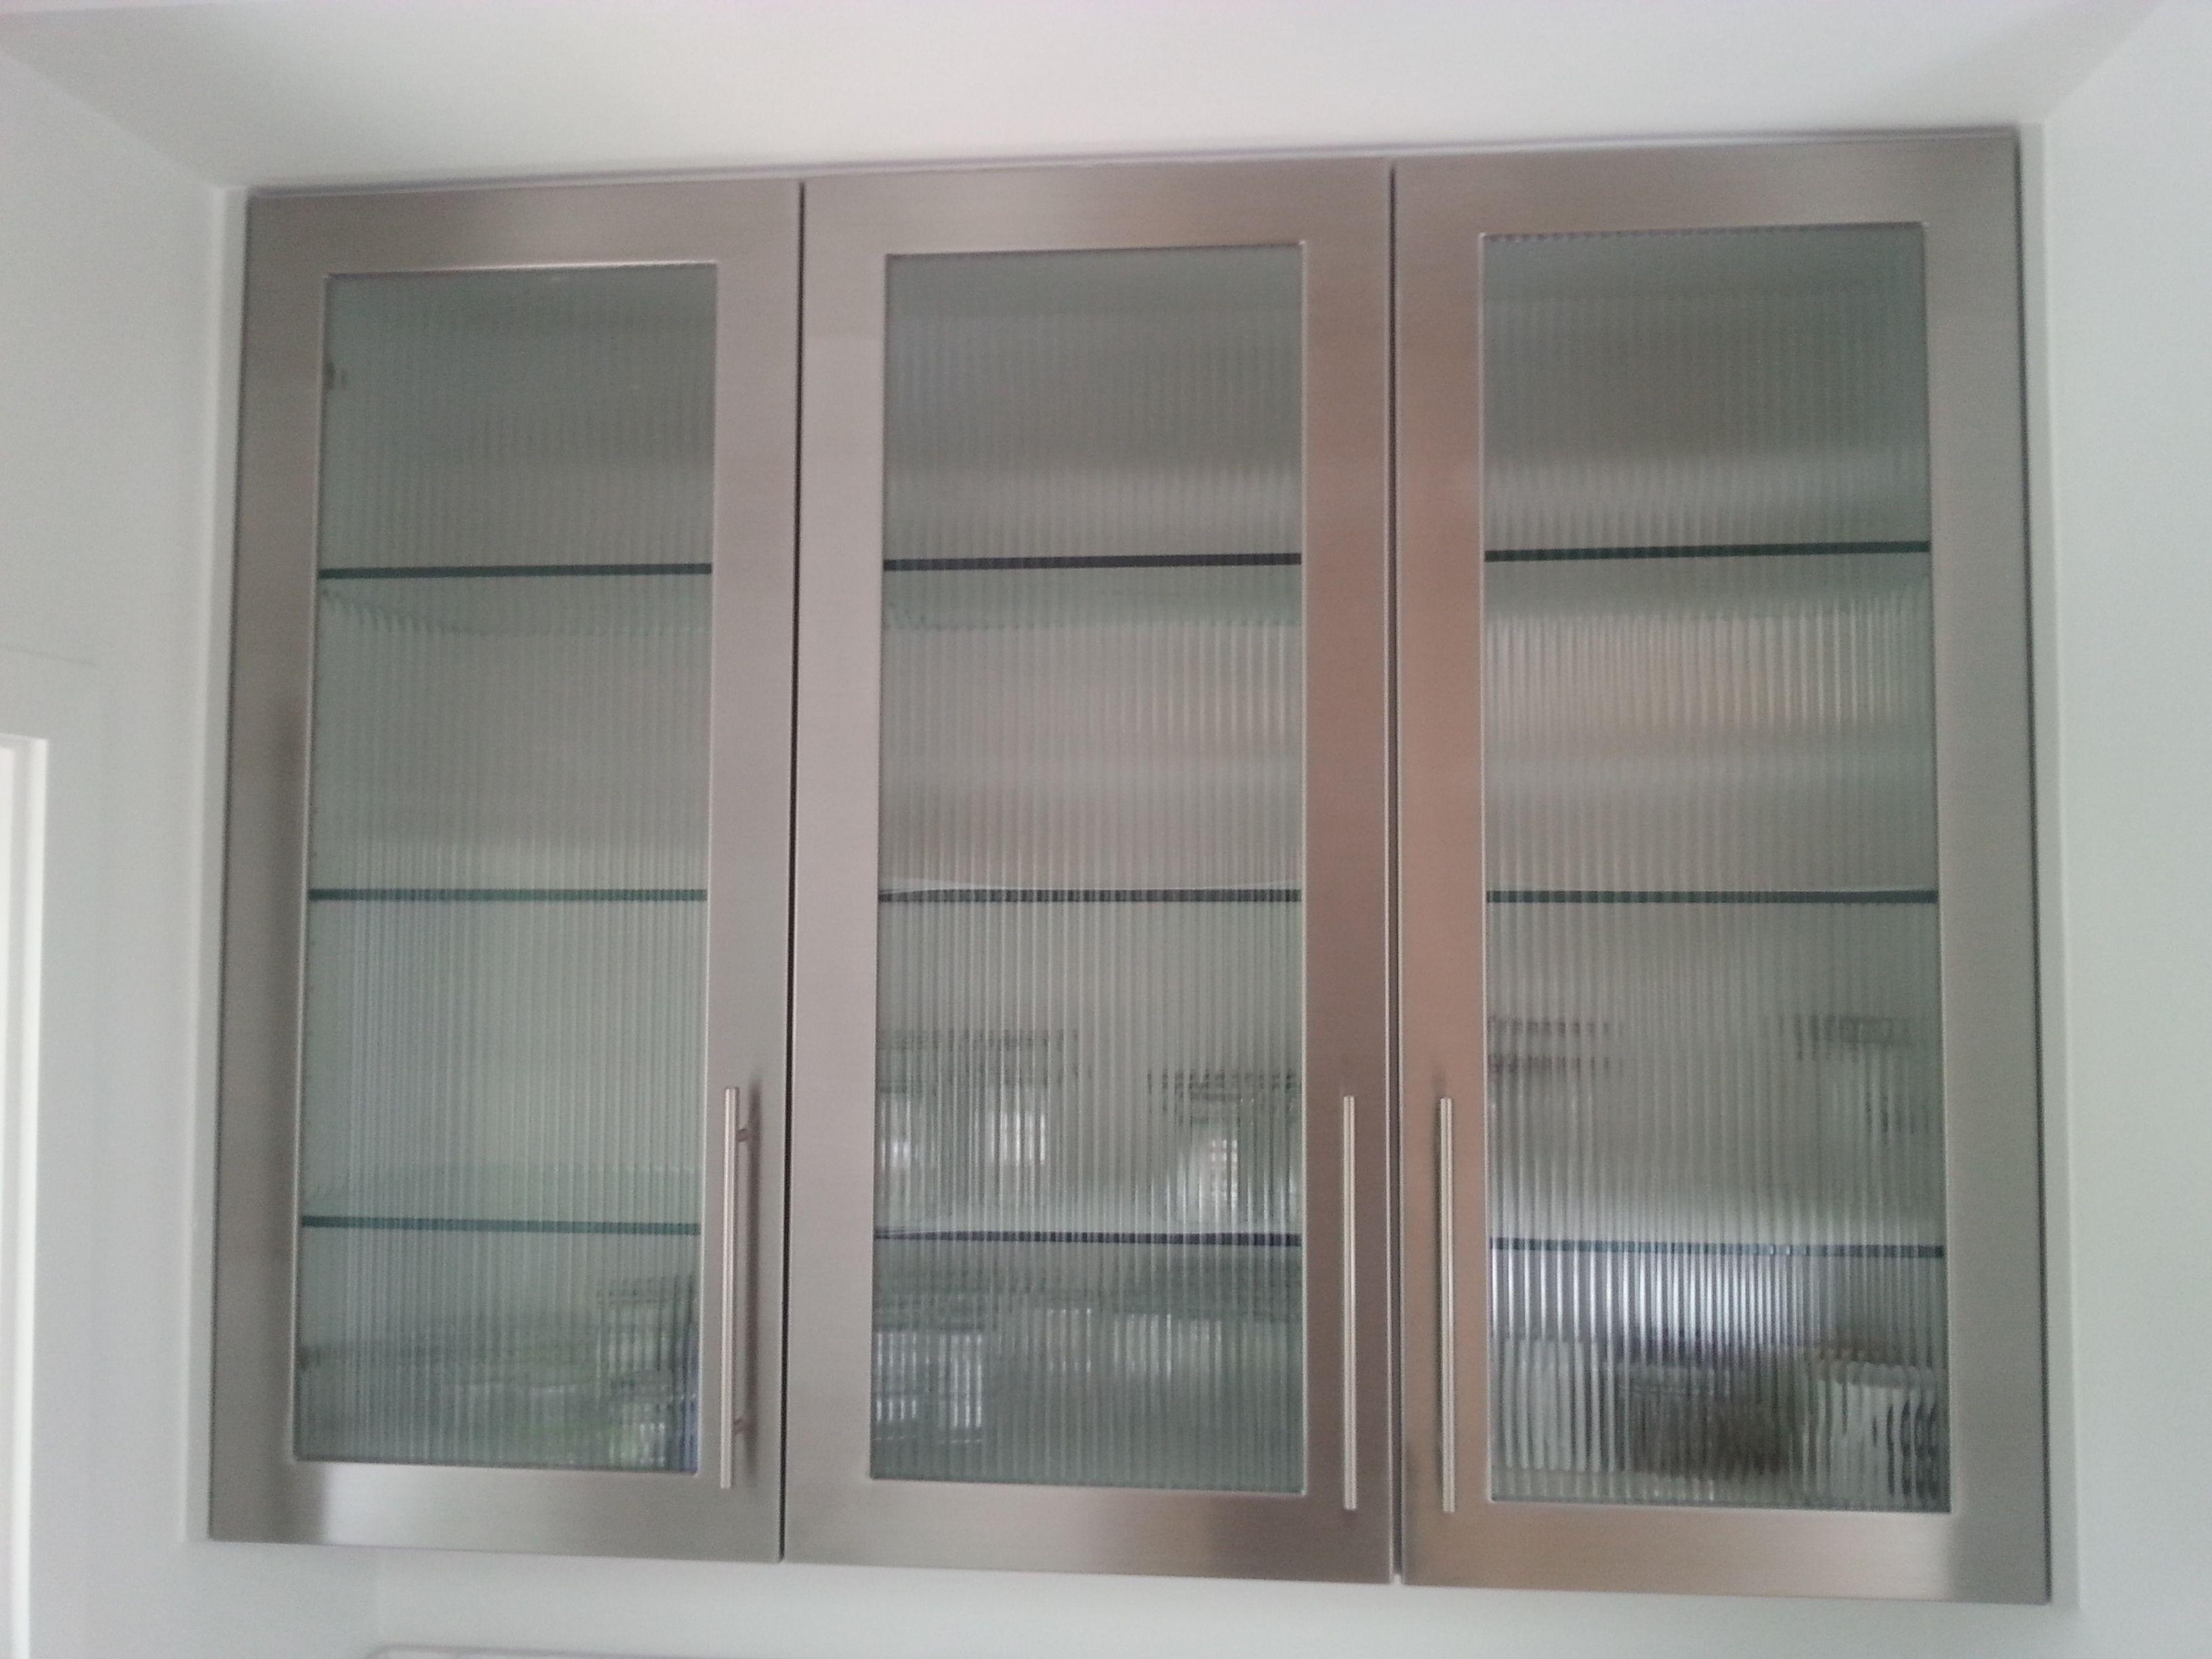 Custom Stainless Steel Cabinet Doors Jnl Stainless Inc With Regard